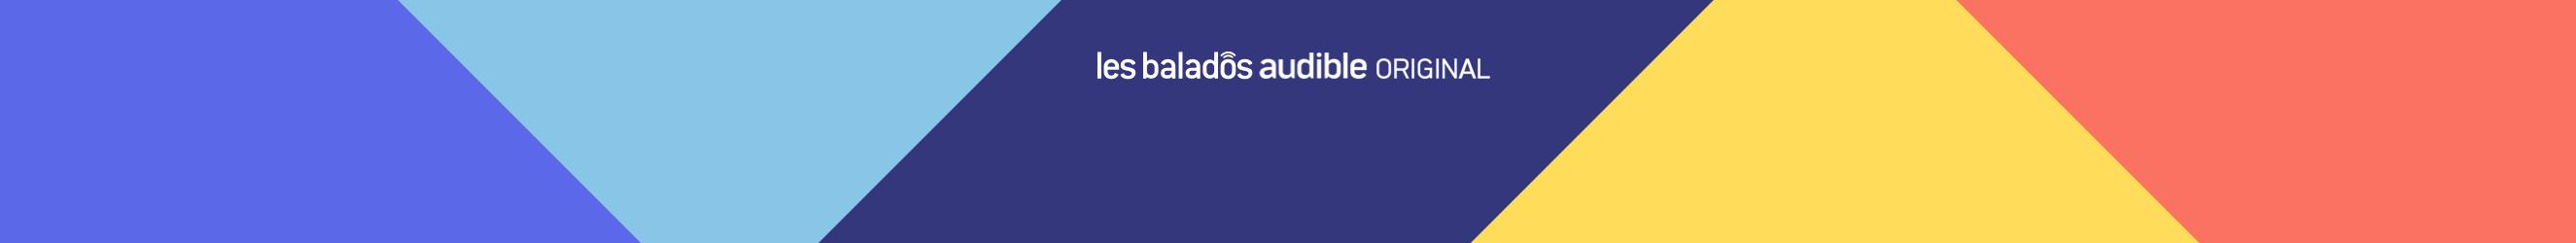 Audible Original Podcasts